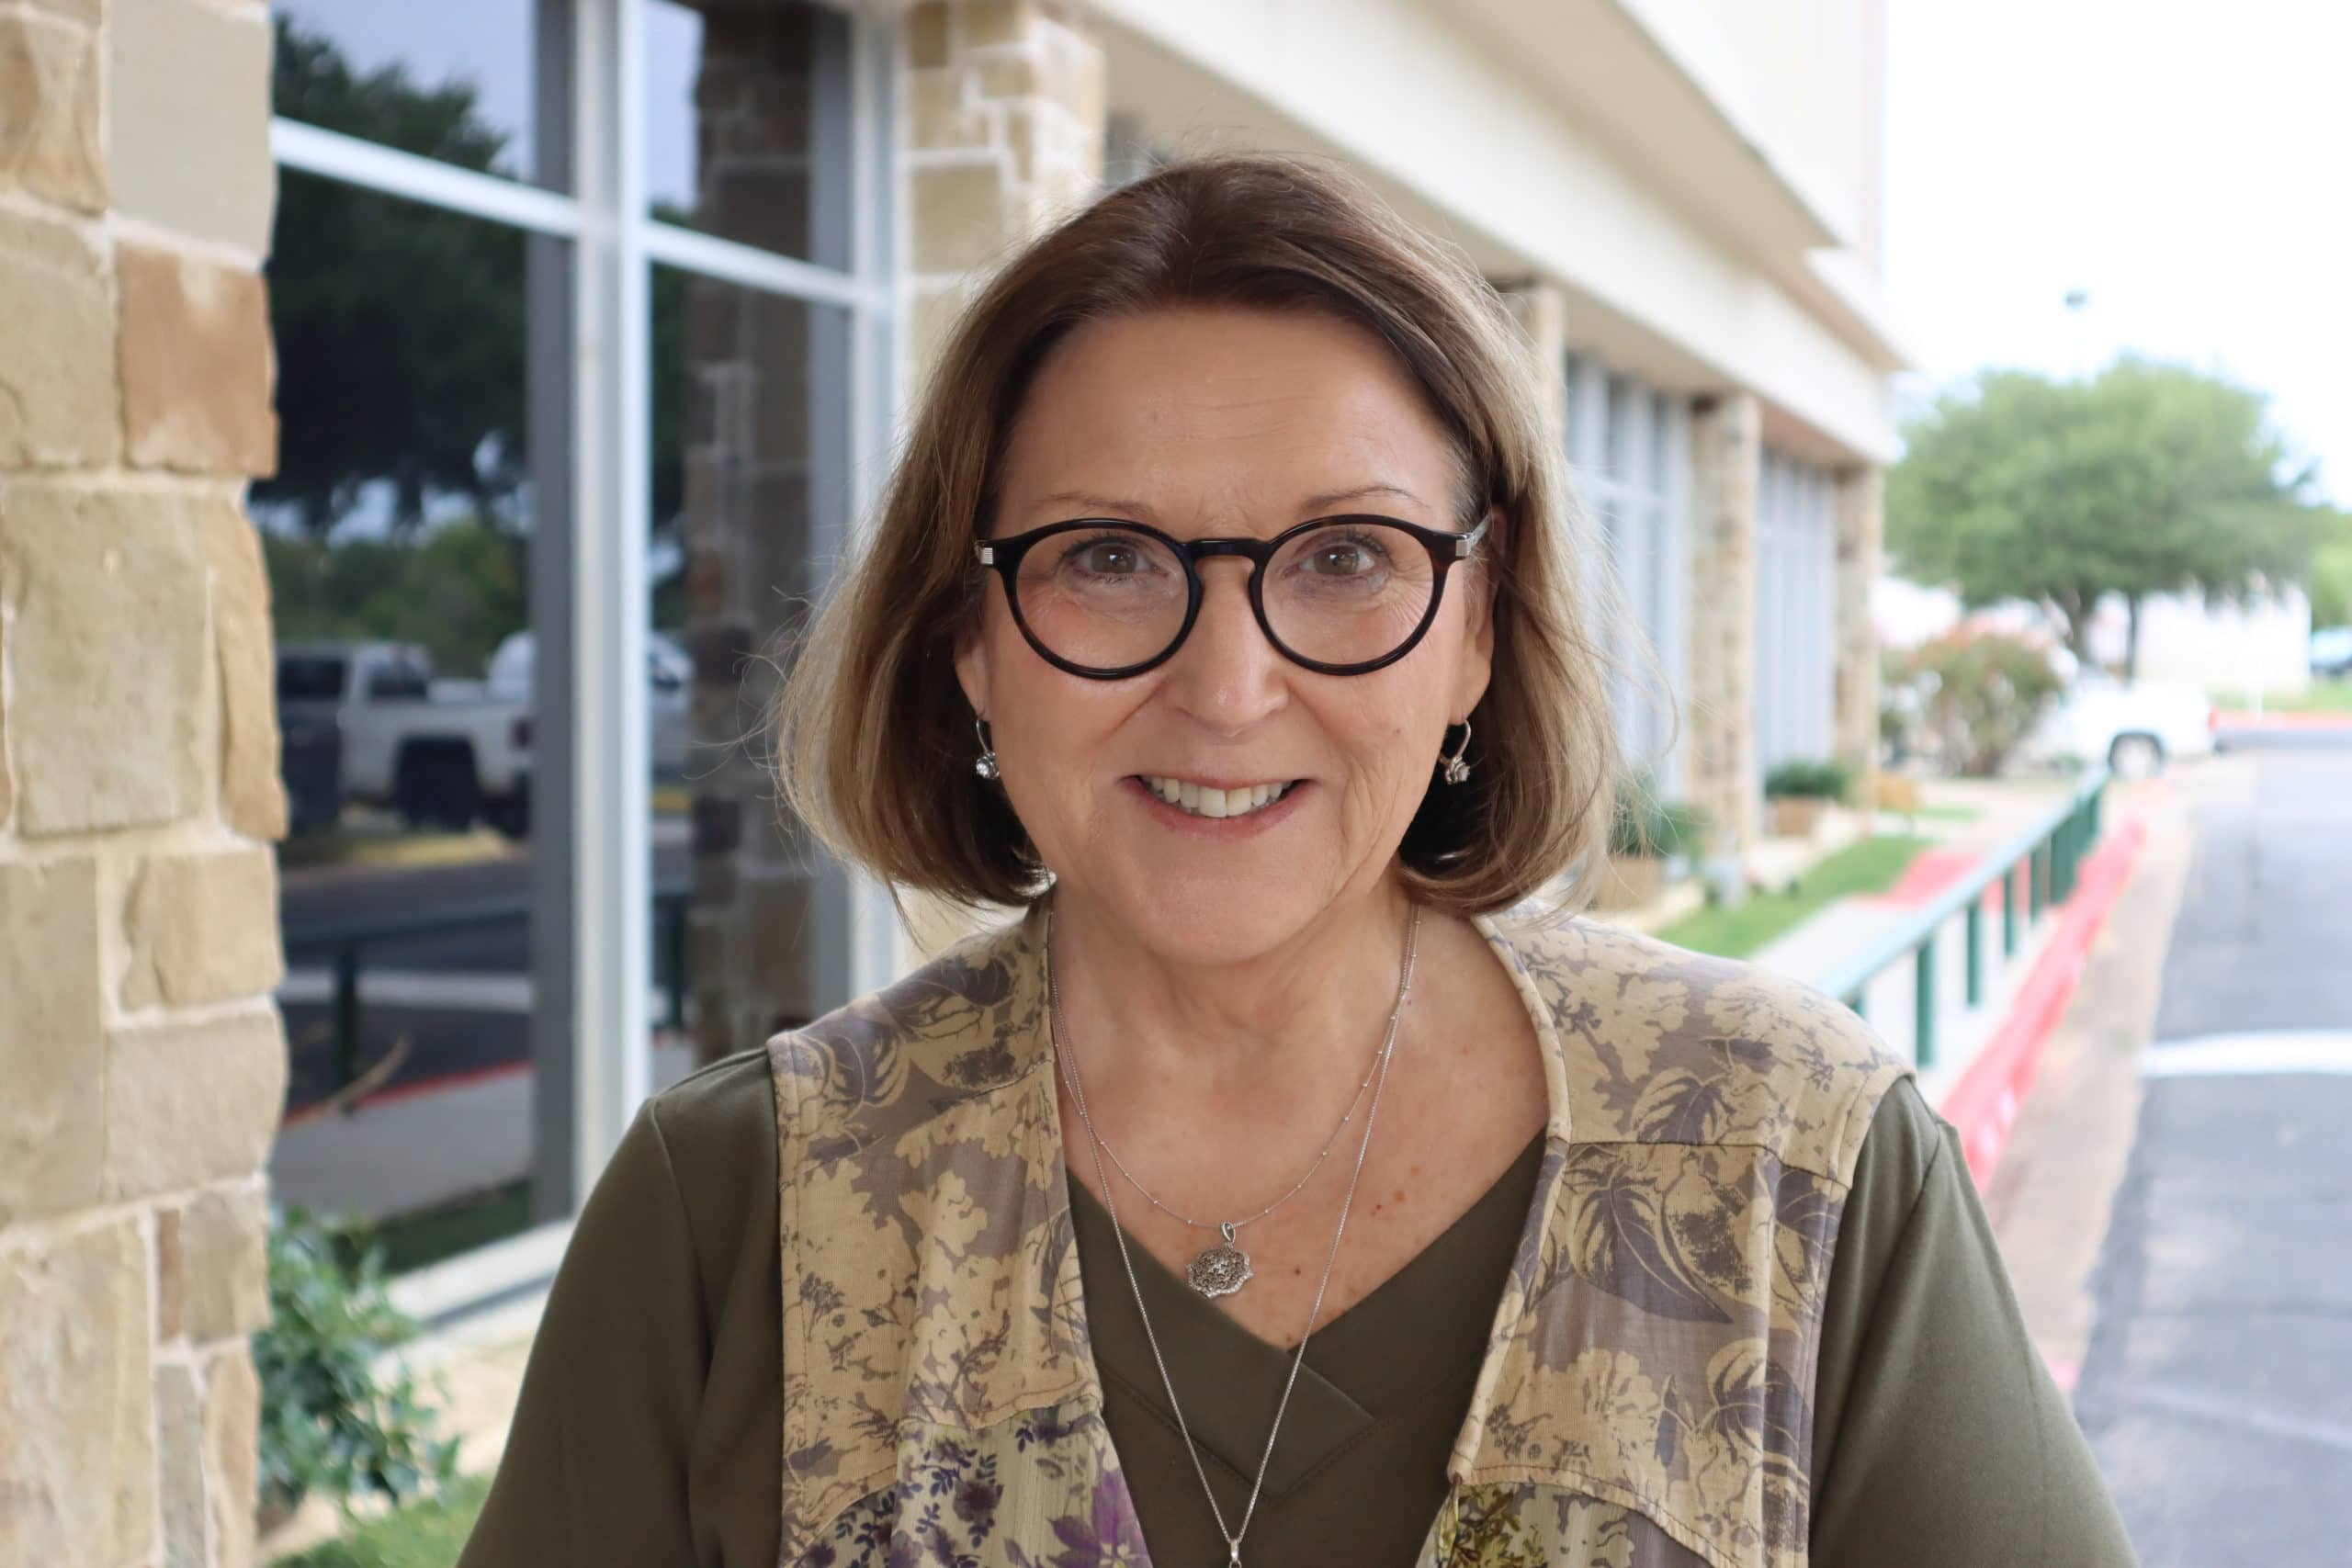 Rose Thomason, MS, SPHR, SHRM-SCP